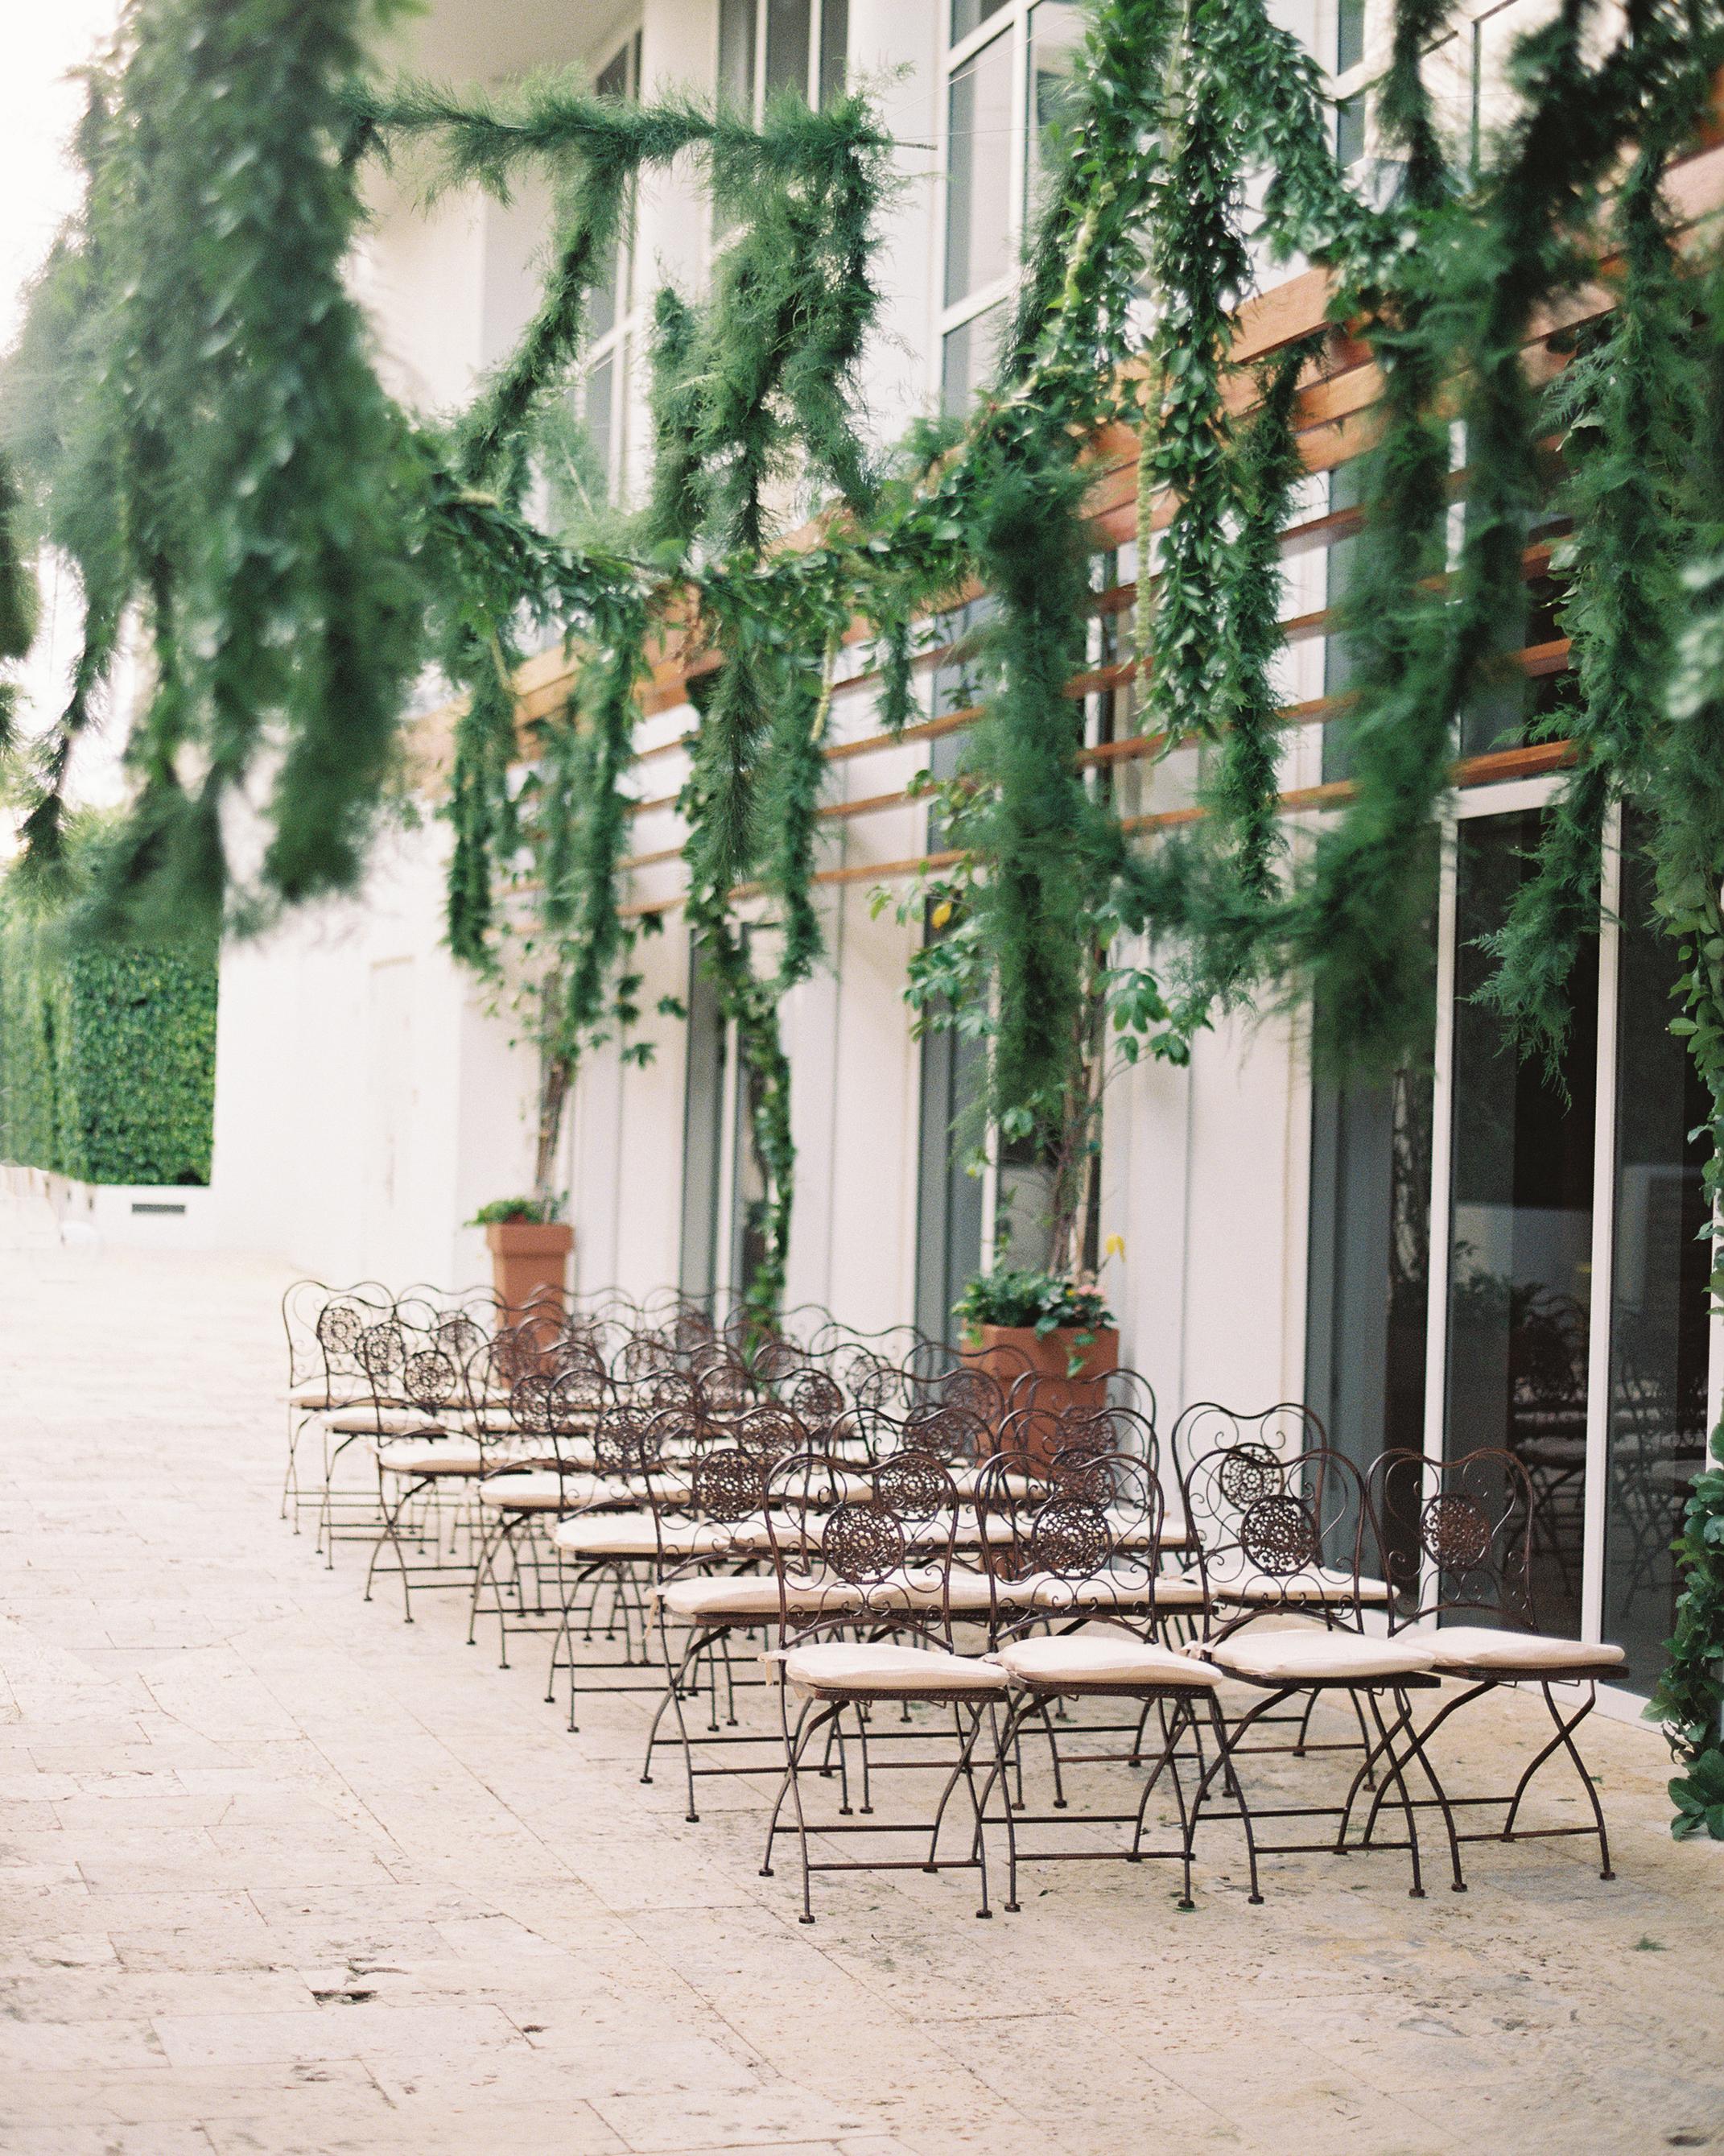 wedding-trends-2015-aisle-decor-1215.jpg